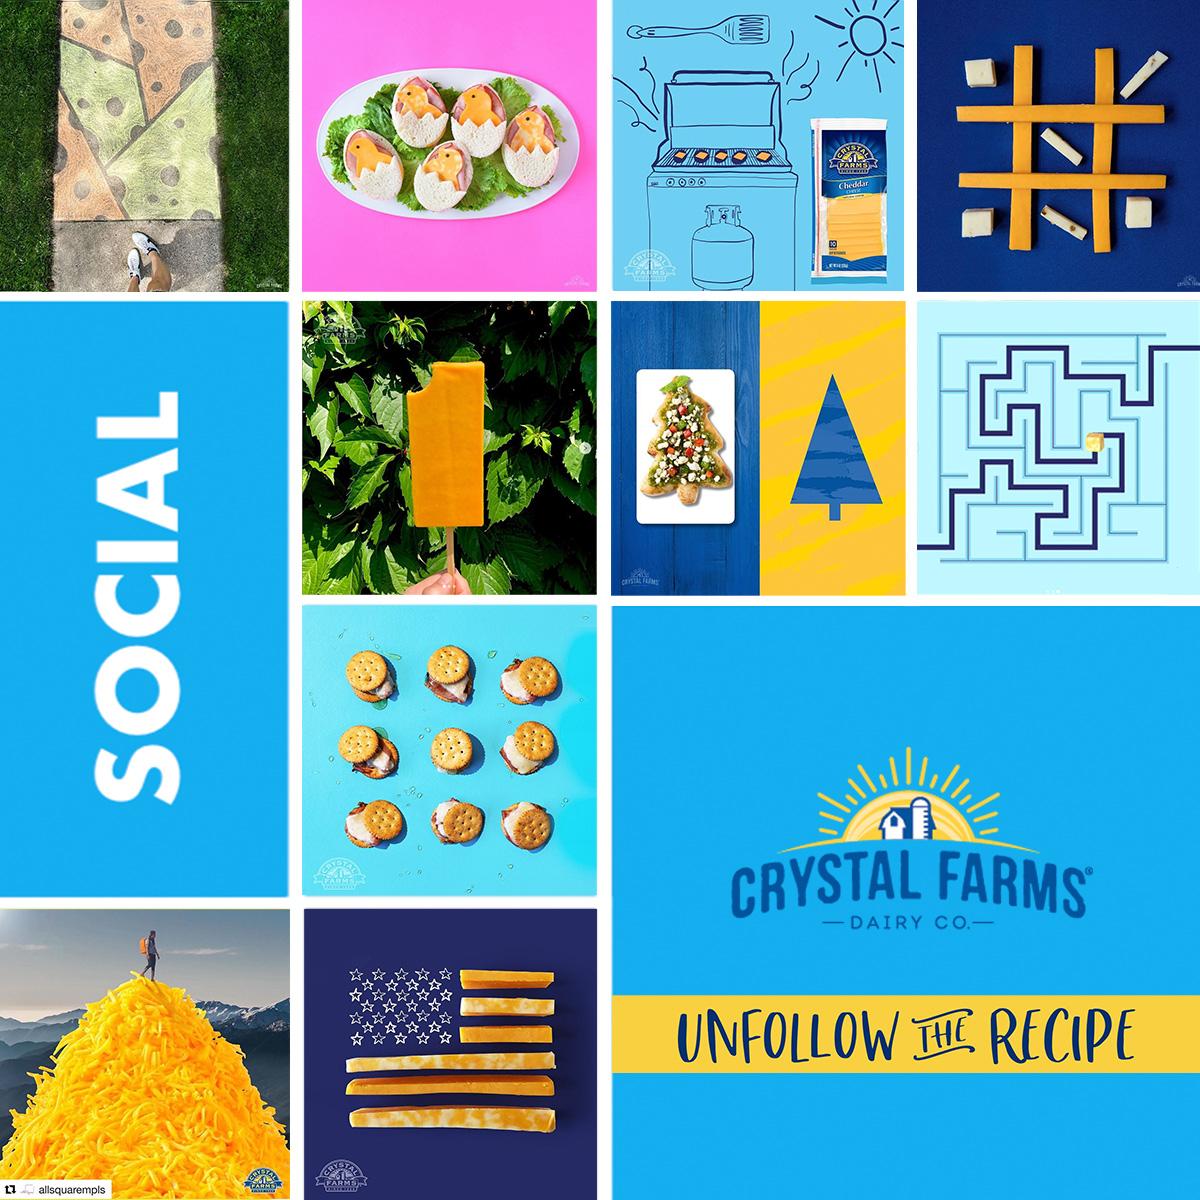 Crystal Farms Unfollow the Recipe Social Media